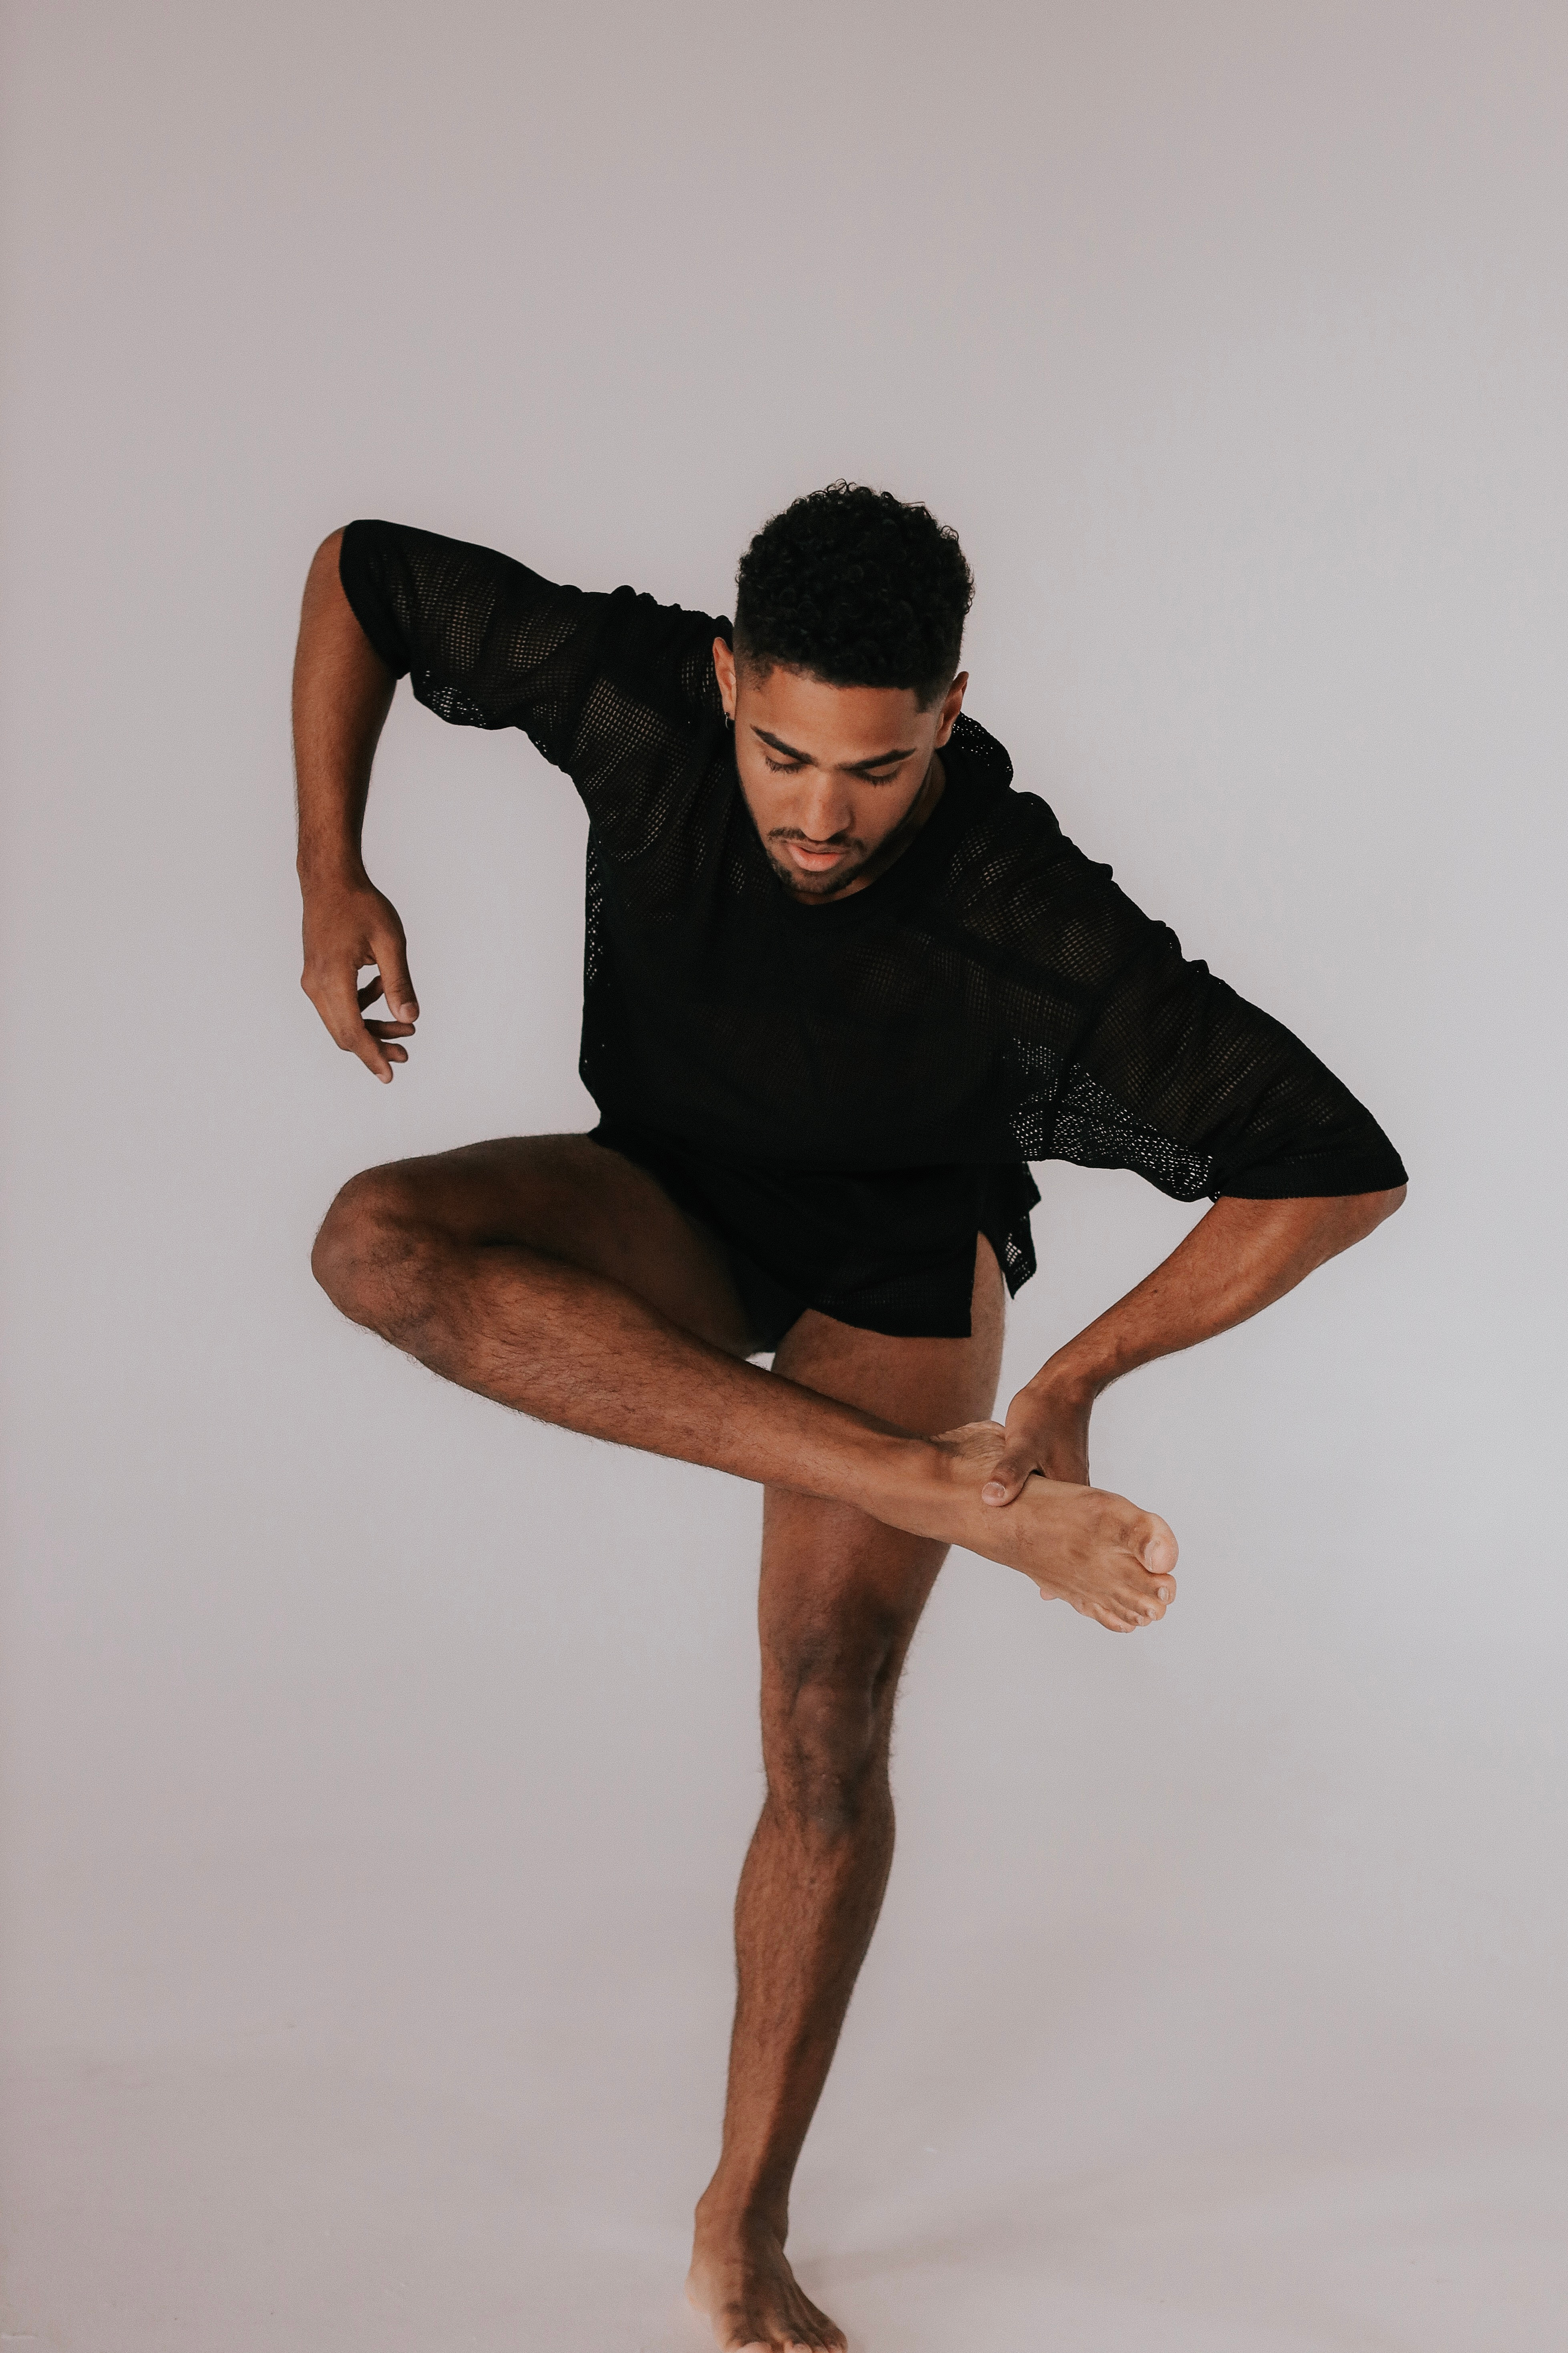 Fitness + Yoga: Movement Matters